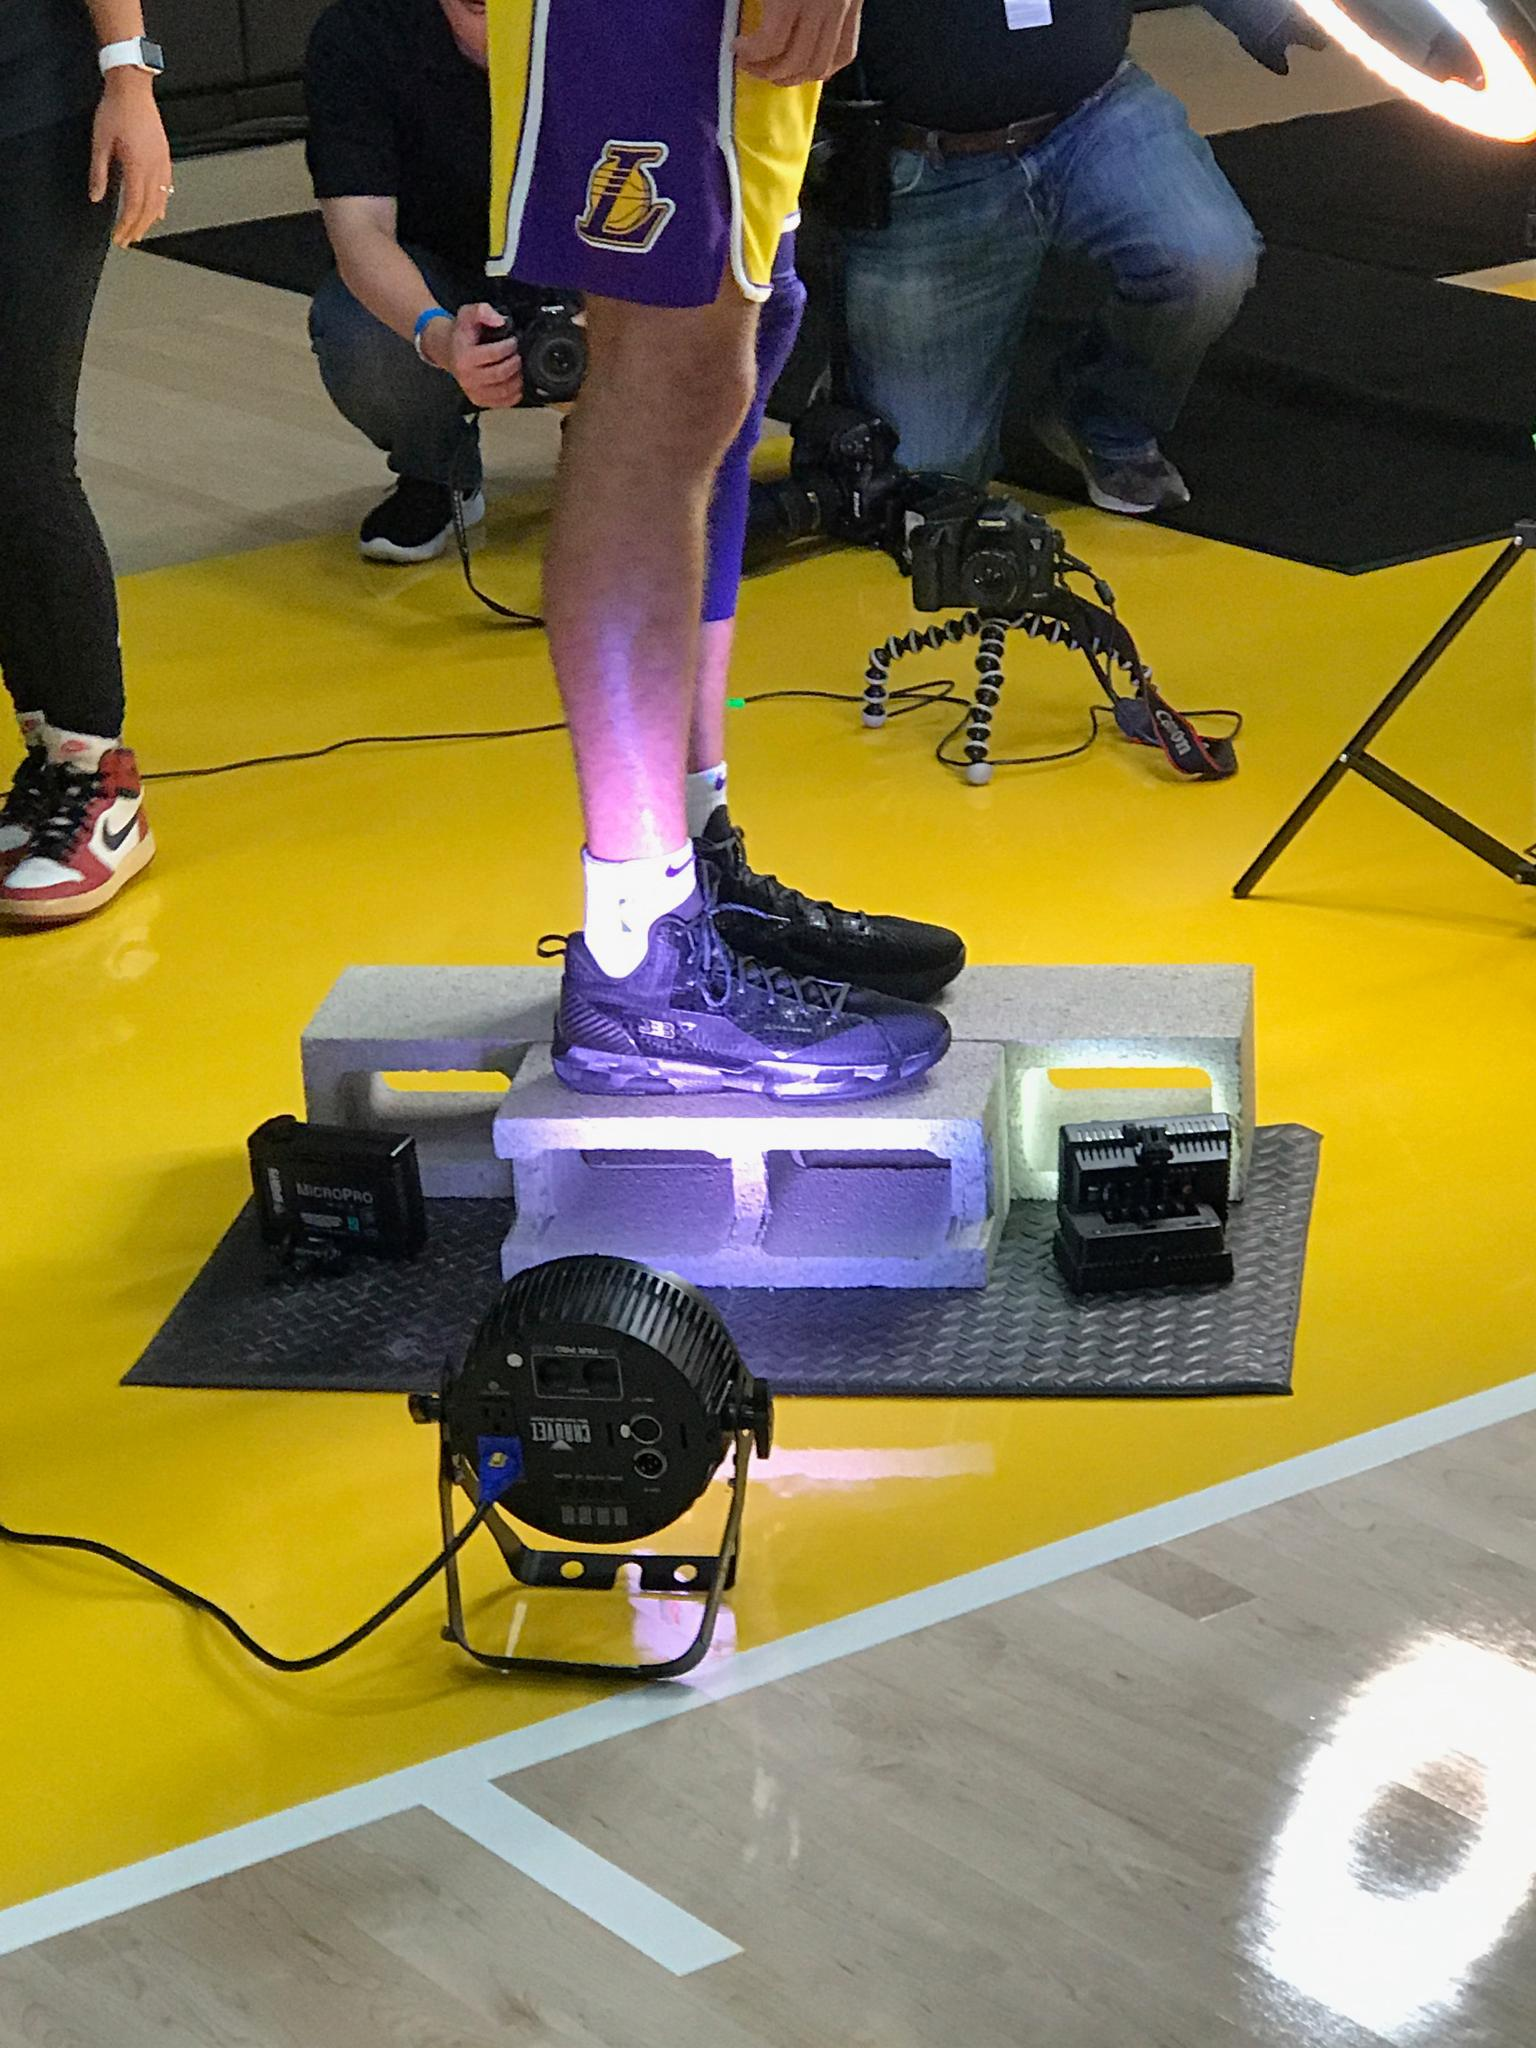 Lonzo's new shoes are in the spotlight ... literally. https://t.co/5EgQHHptgK